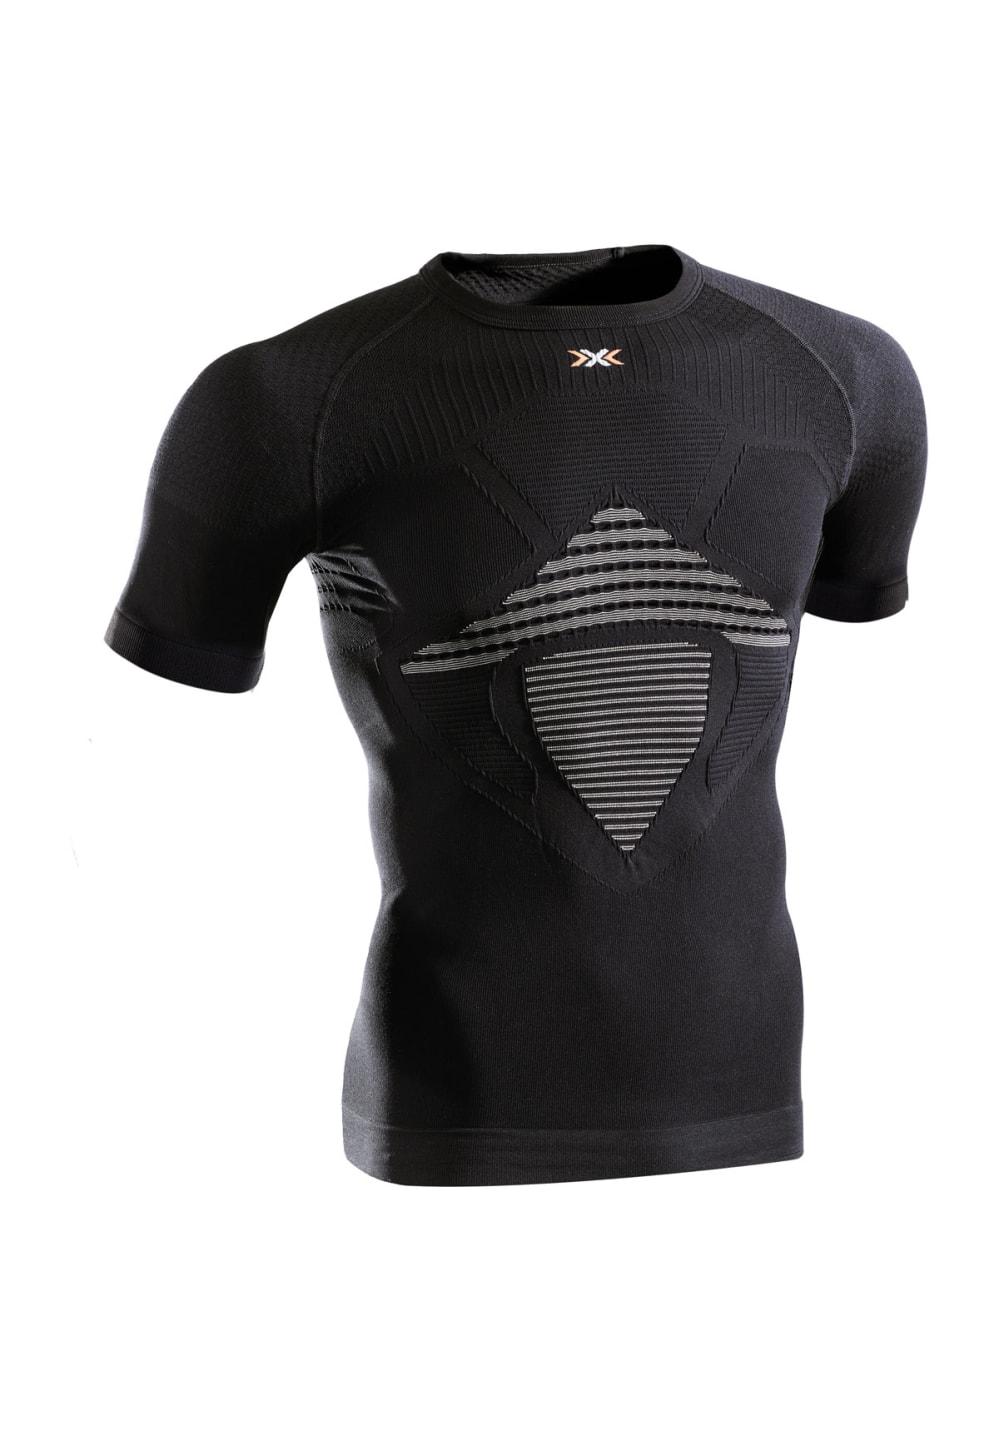 x-bionic-energizer-mk2-shirt-short-sleeves-sous-vetements-sport-homme -noir-pid-000000000010082198.jpg 376ff6040608